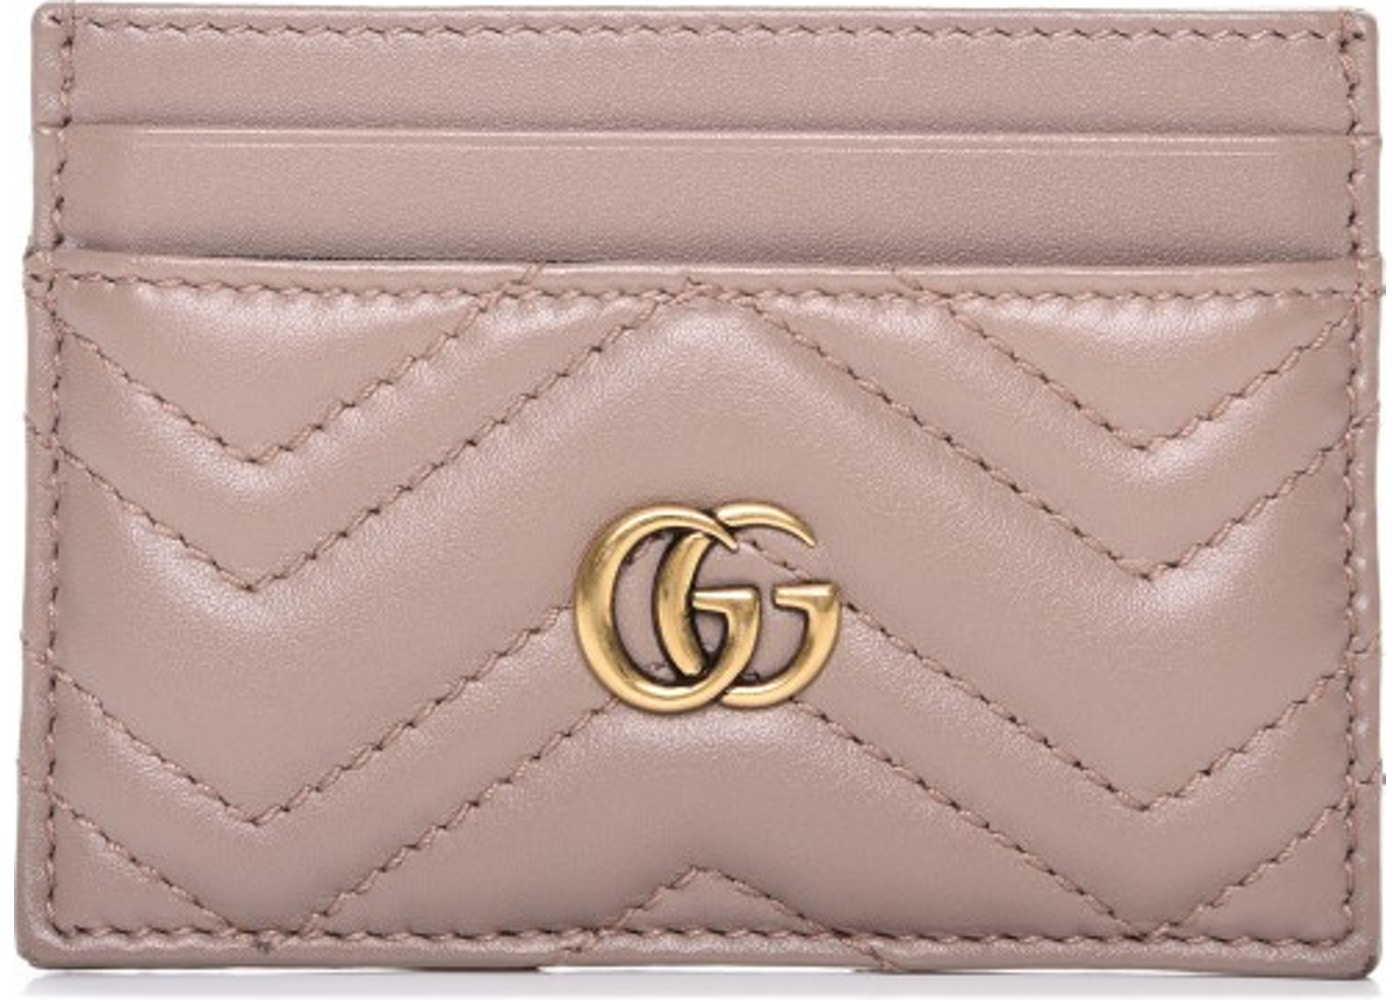 150954e83 Gucci Marmont Card Case Monogram Matelasse GG Dusty Pink. Monogram Matelasse  GG Dusty Pink